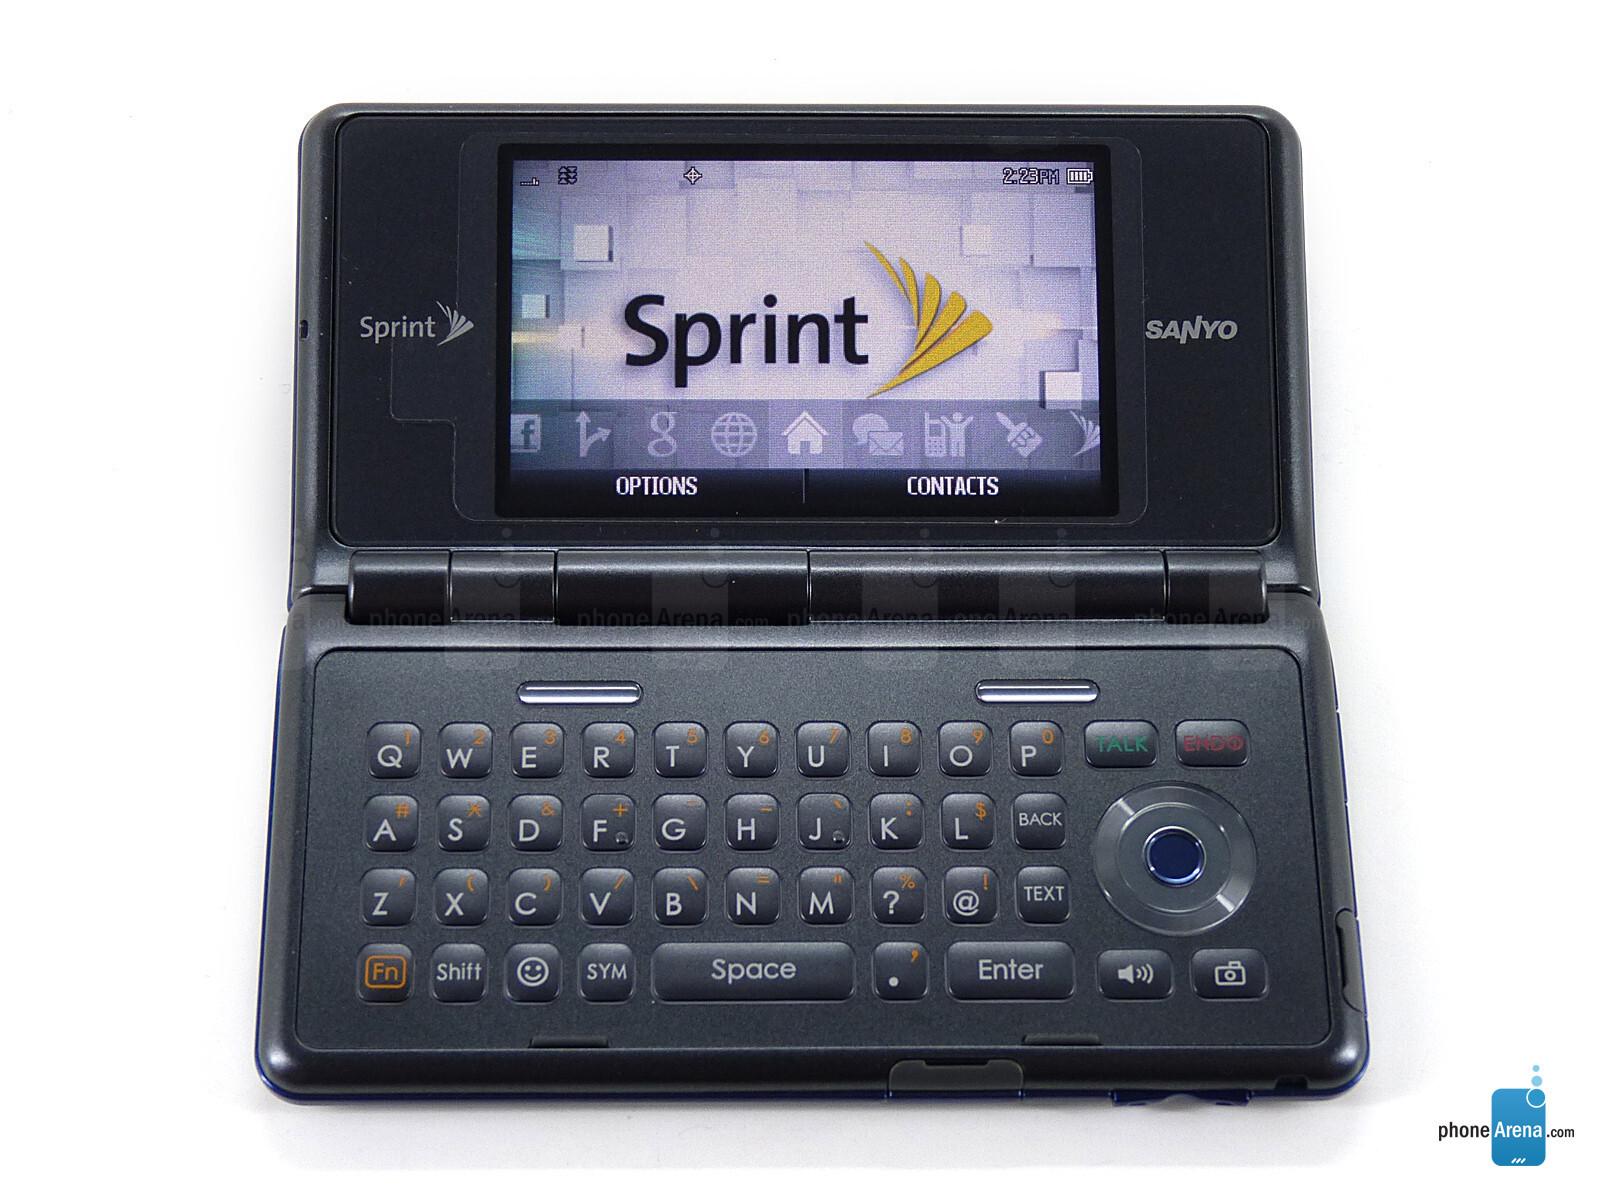 sanyo innuendo photos rh phonearena com Kyocera Innuendo Manual BlackBerry Torch 9810 Manual